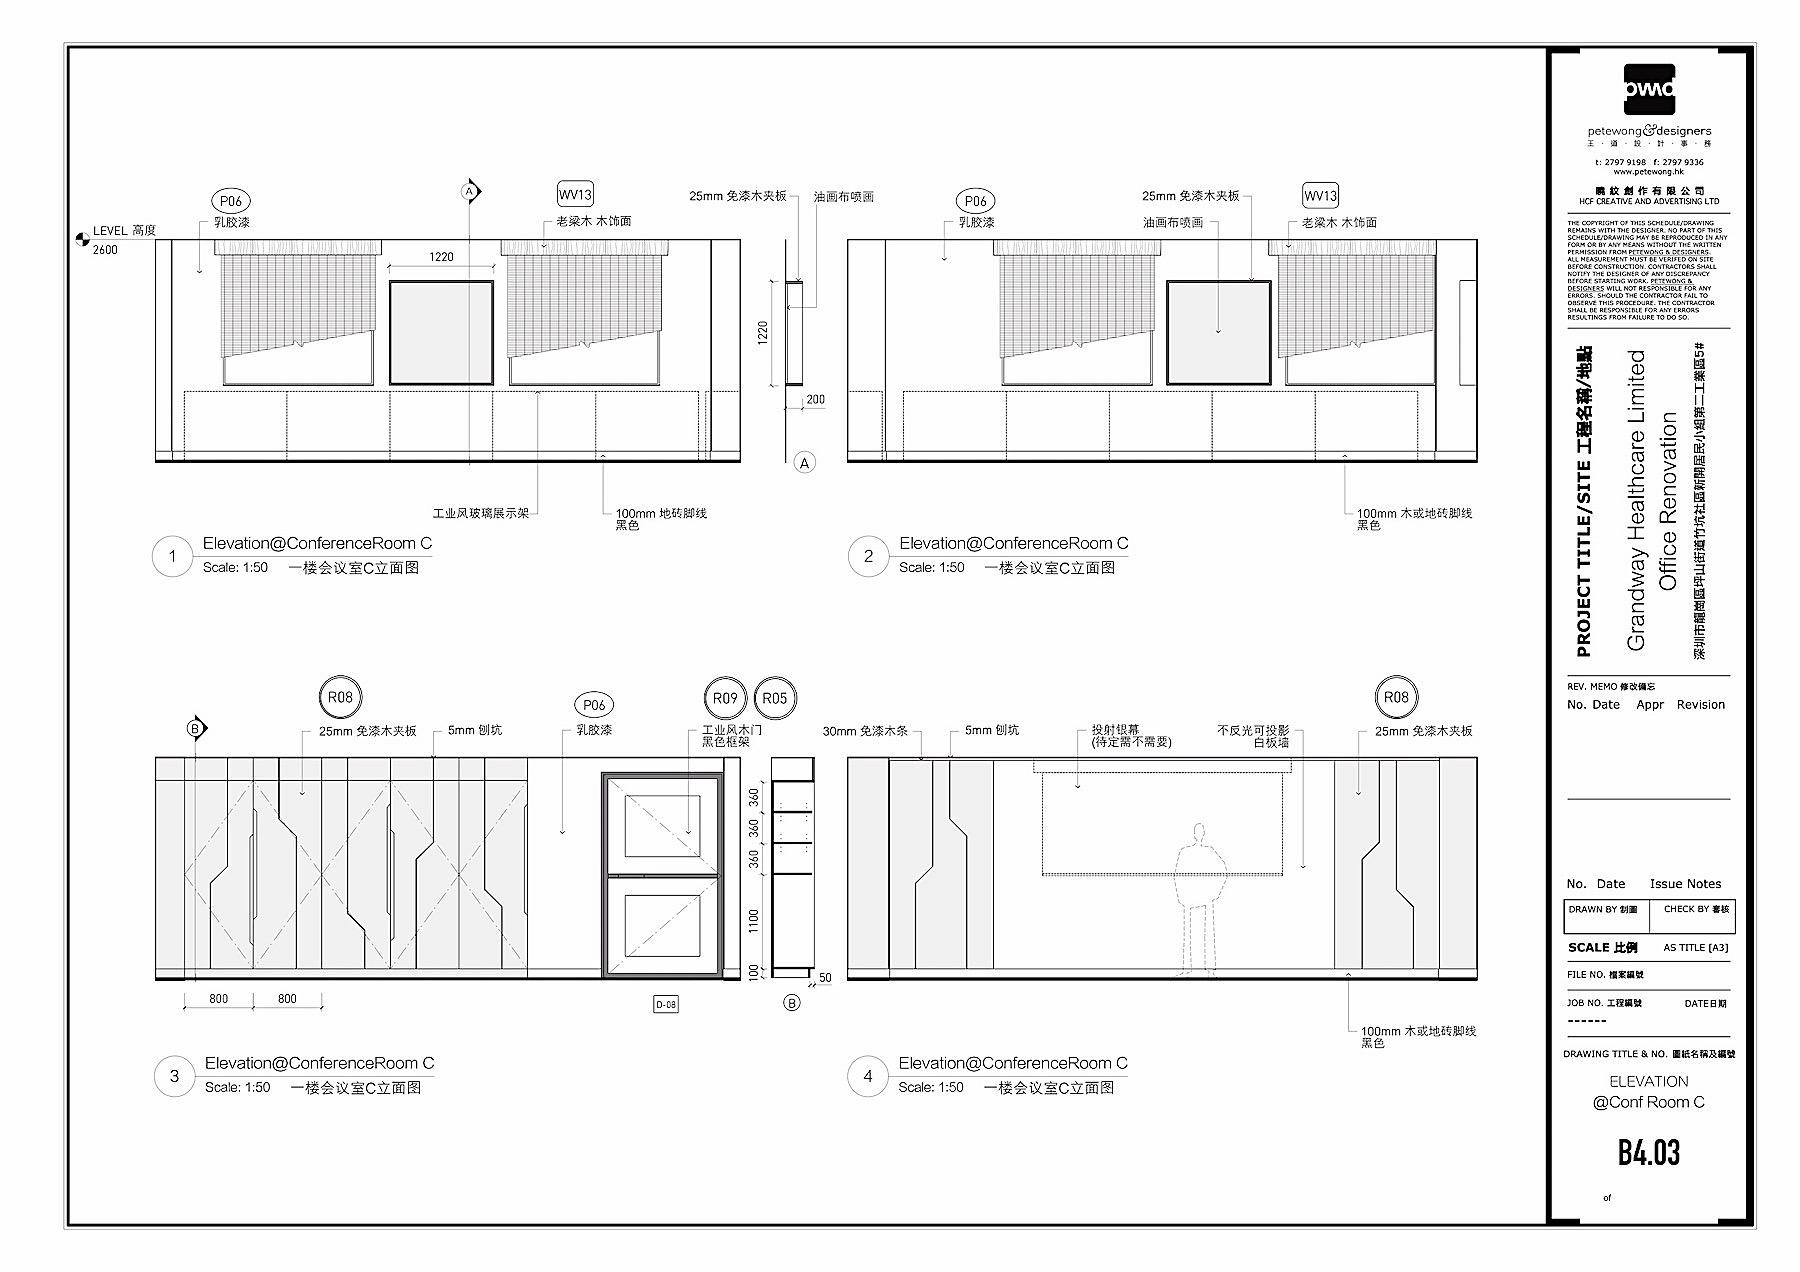 Grandway Office Renovation 2018 Drawing 11